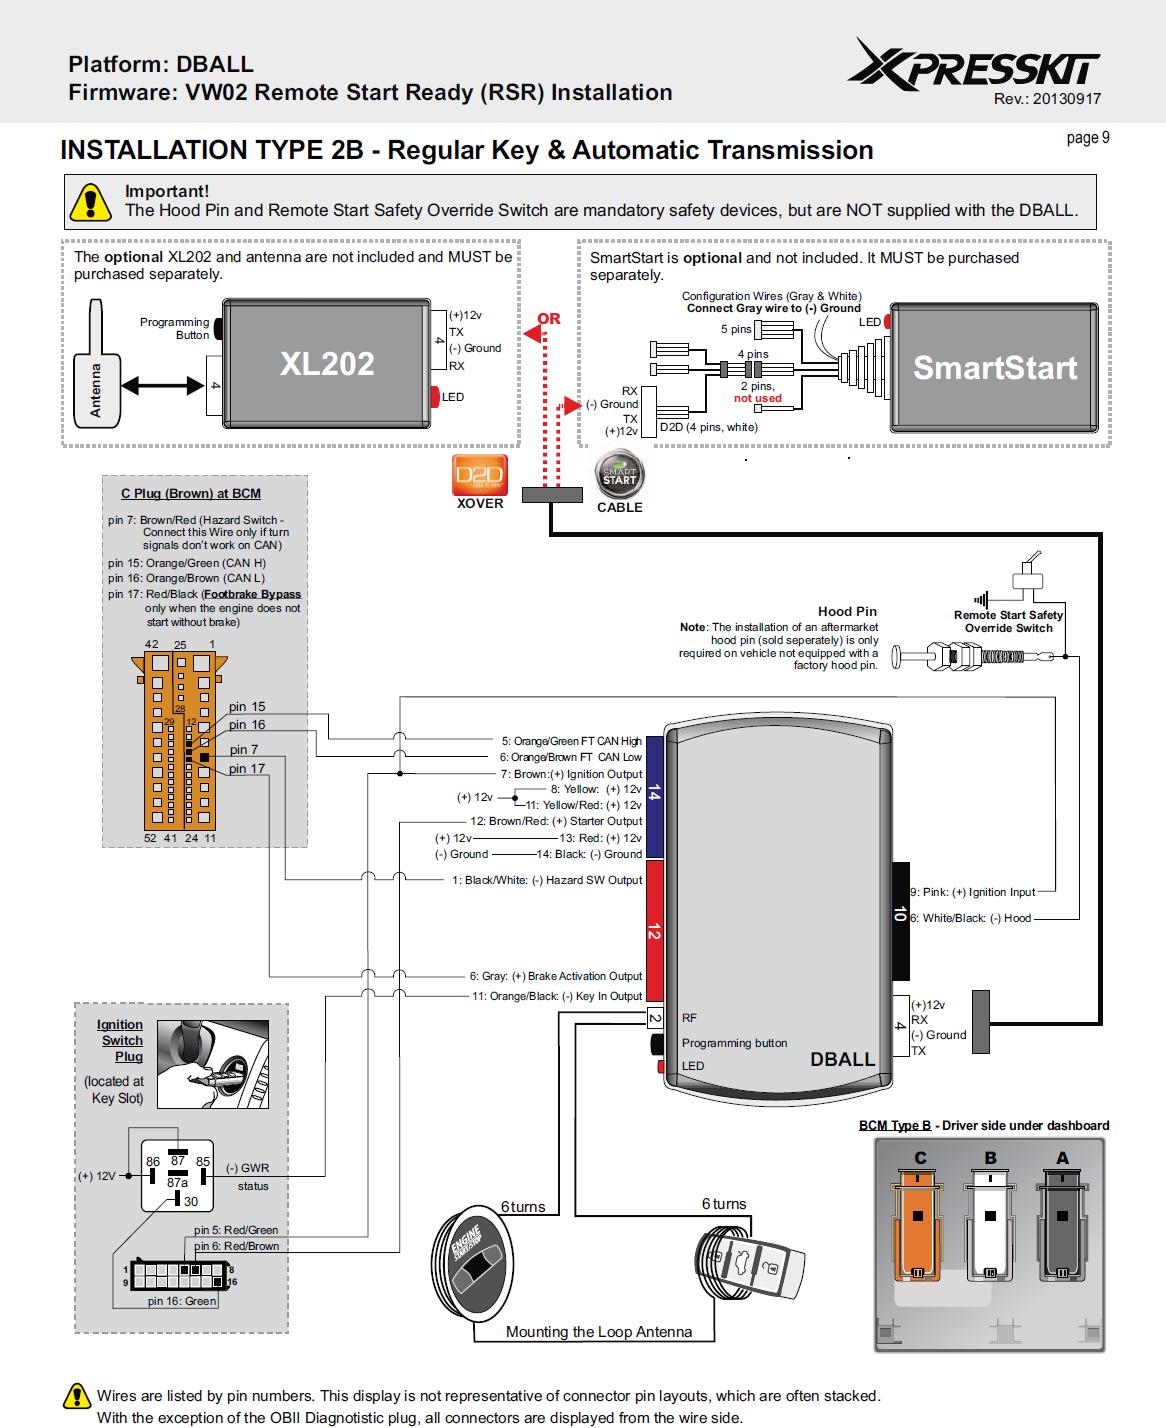 BB_6755] Viper Smart Start Wiring Diagram Download DiagramStap Mimig Aeocy Vesi Odga Gray Ophag Numap Mohammedshrine Librar Wiring 101